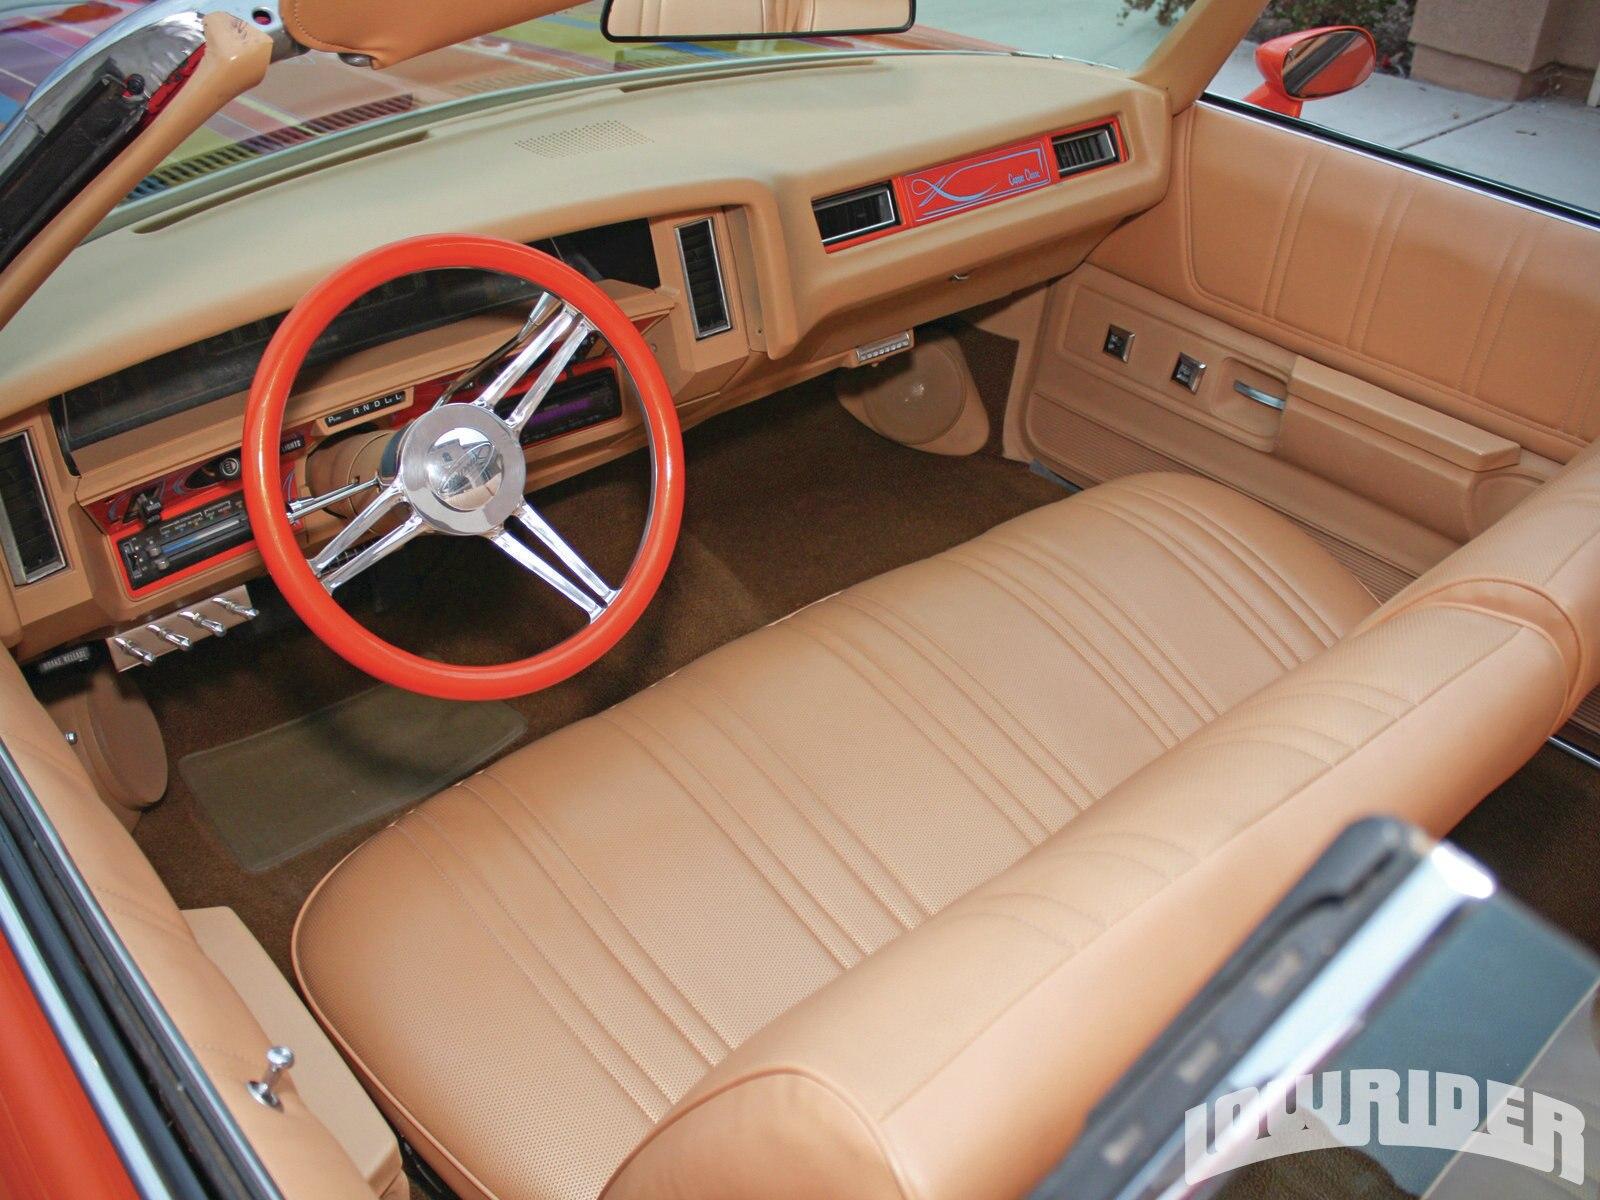 1975 Chevrolet Caprice Lowrider Magazine